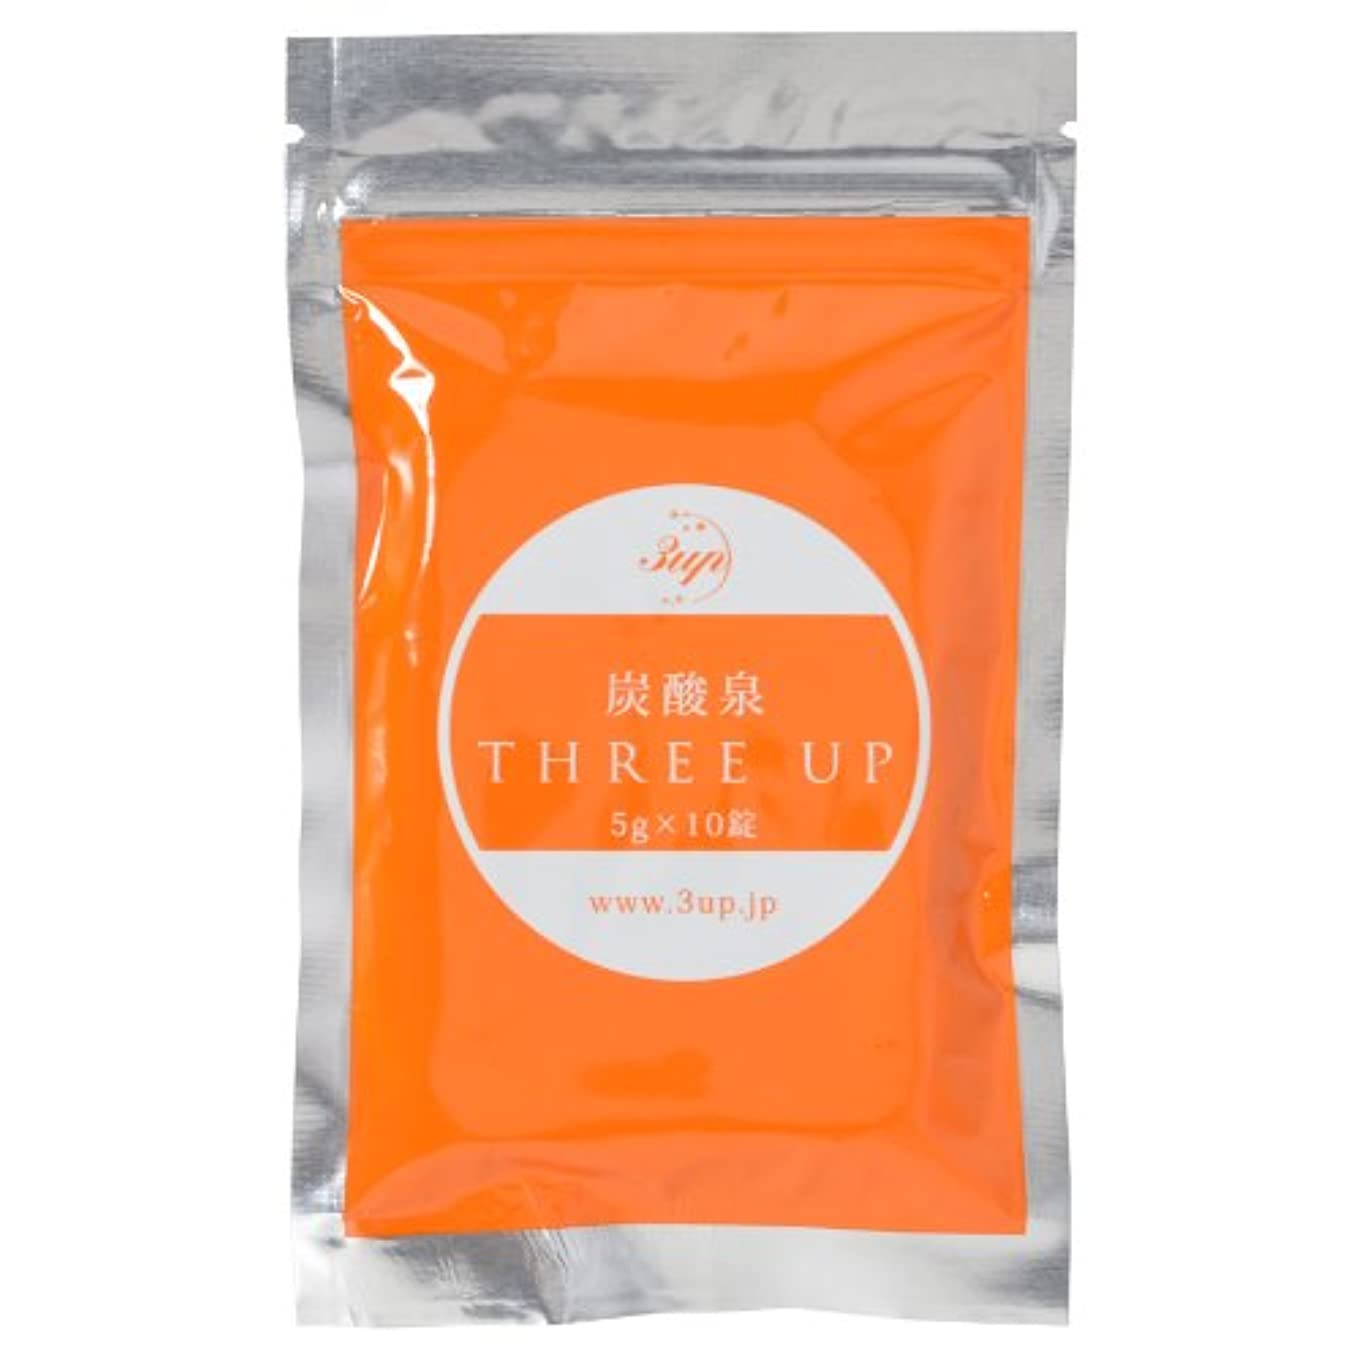 3upスリーアップ 重炭酸イオンタブレット(洗顔用) 1袋:5g×10錠